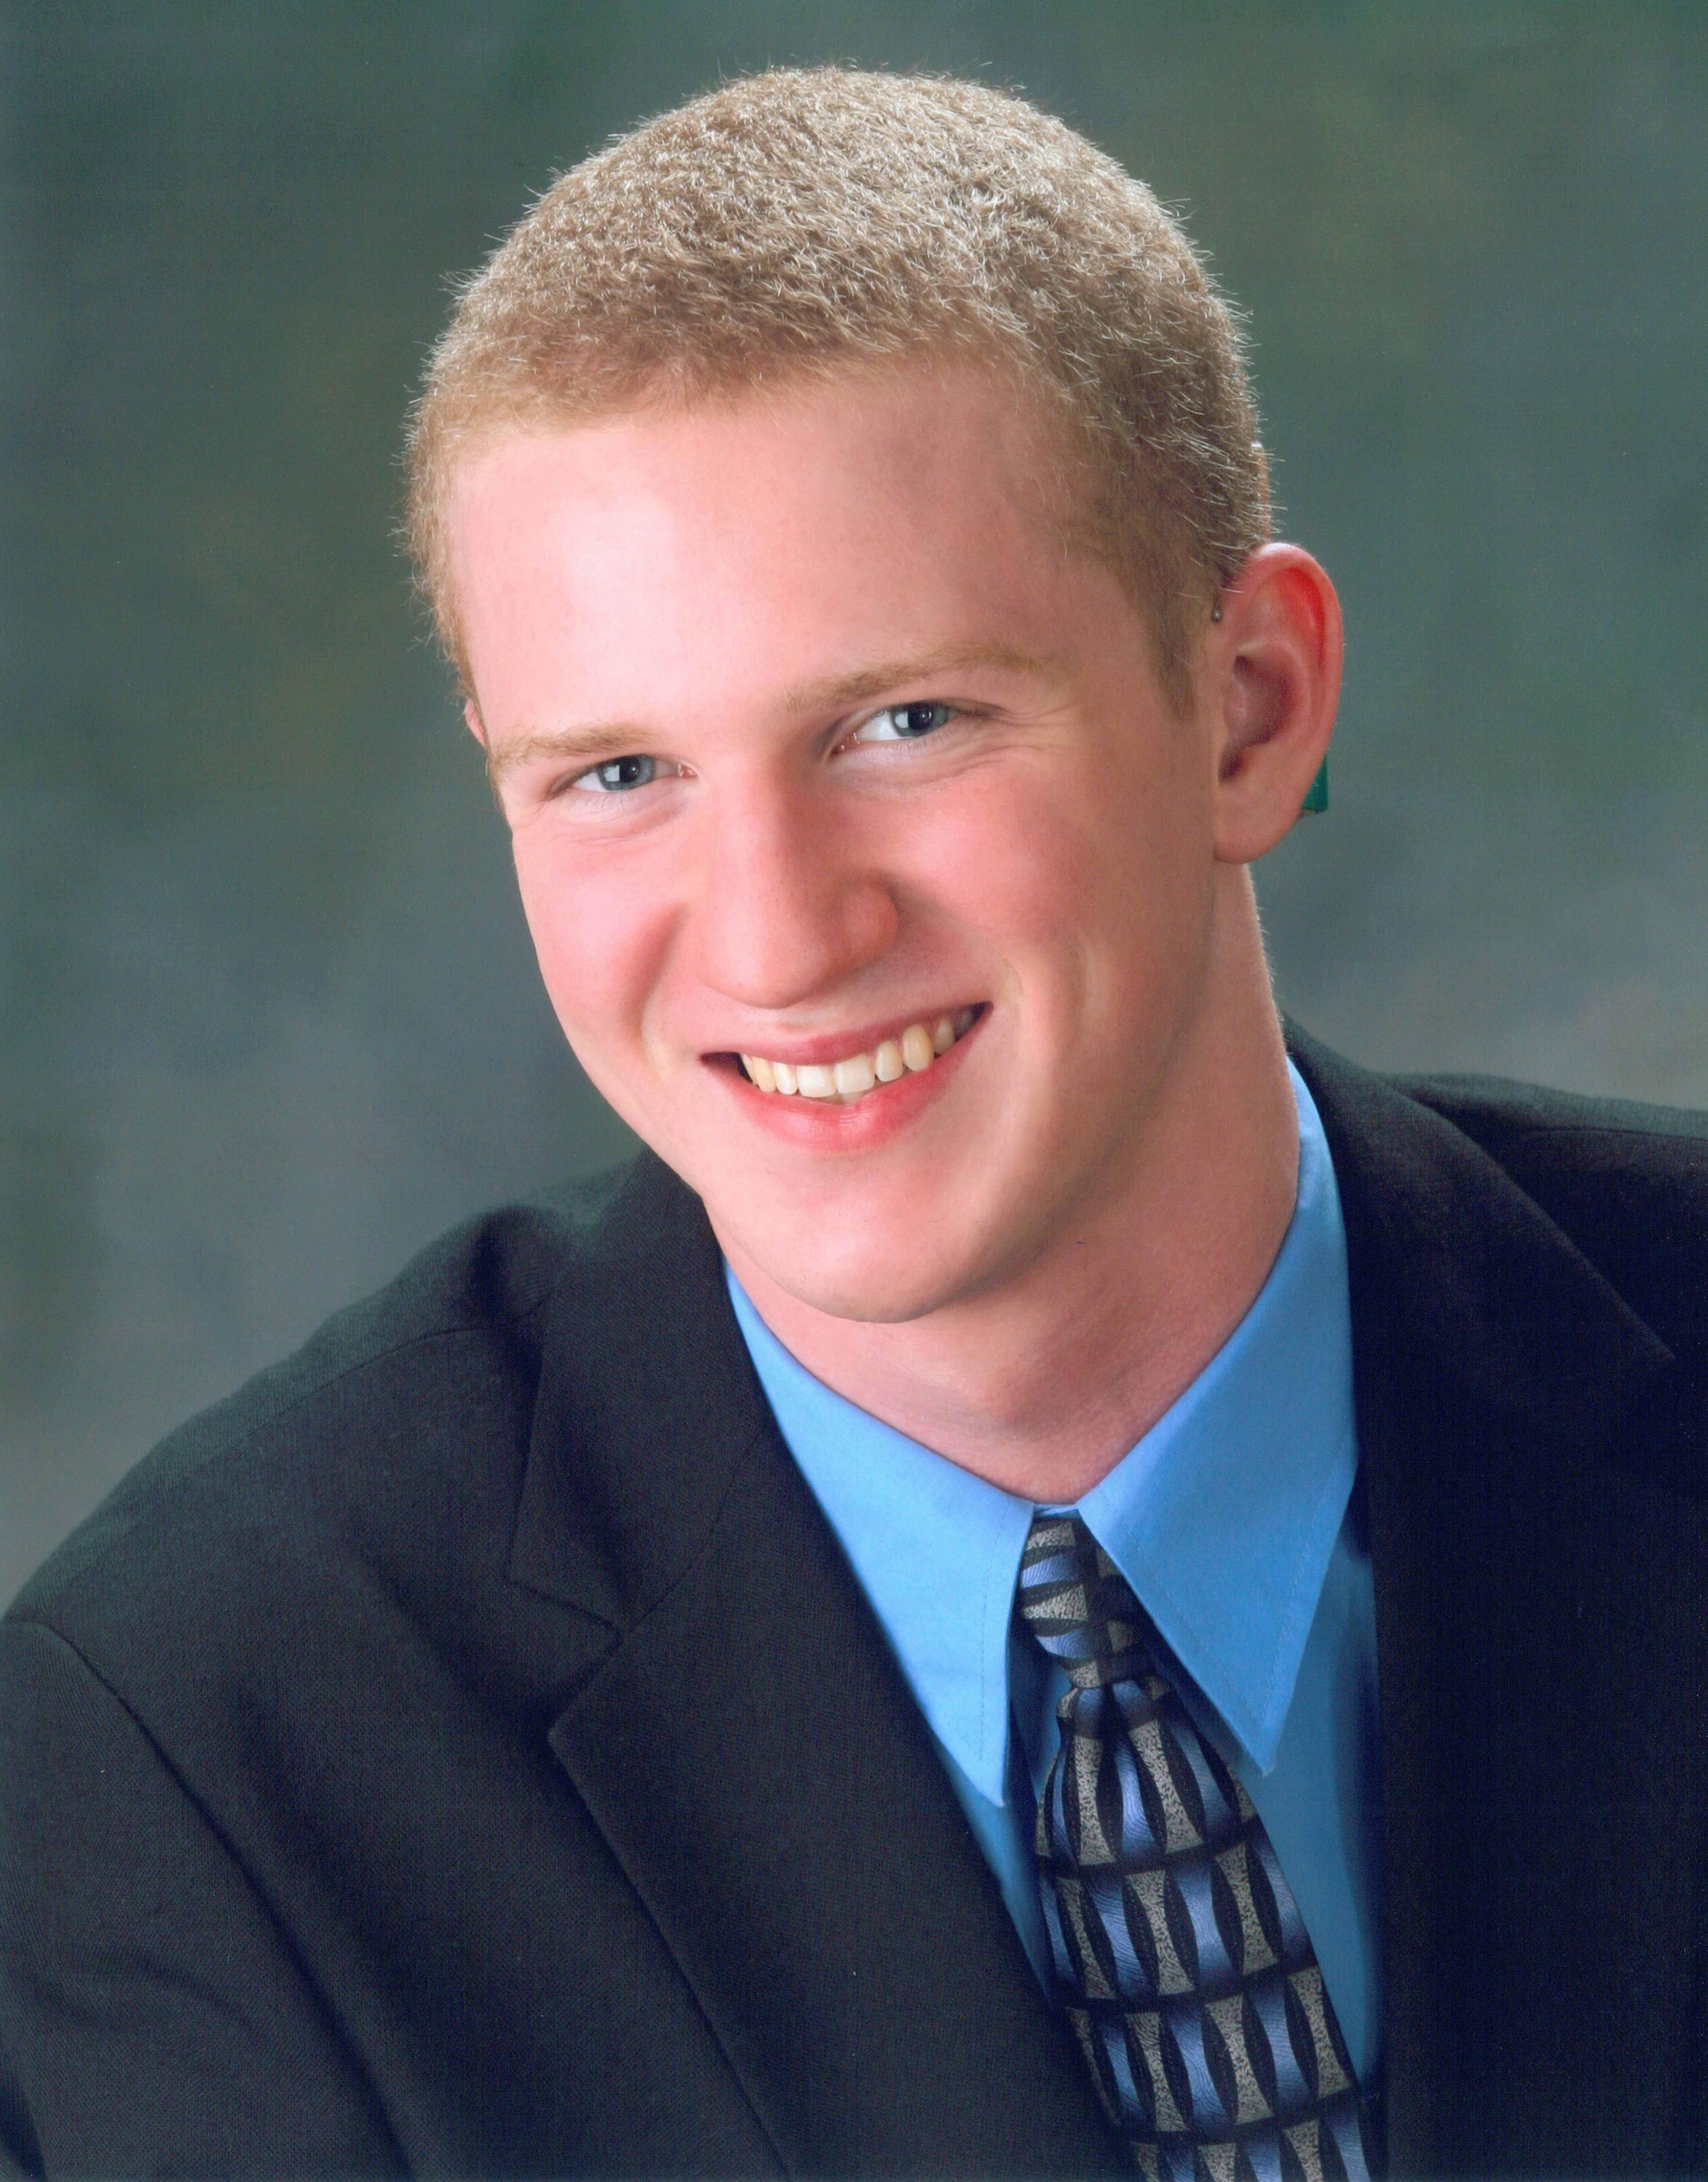 Tyler McFarland